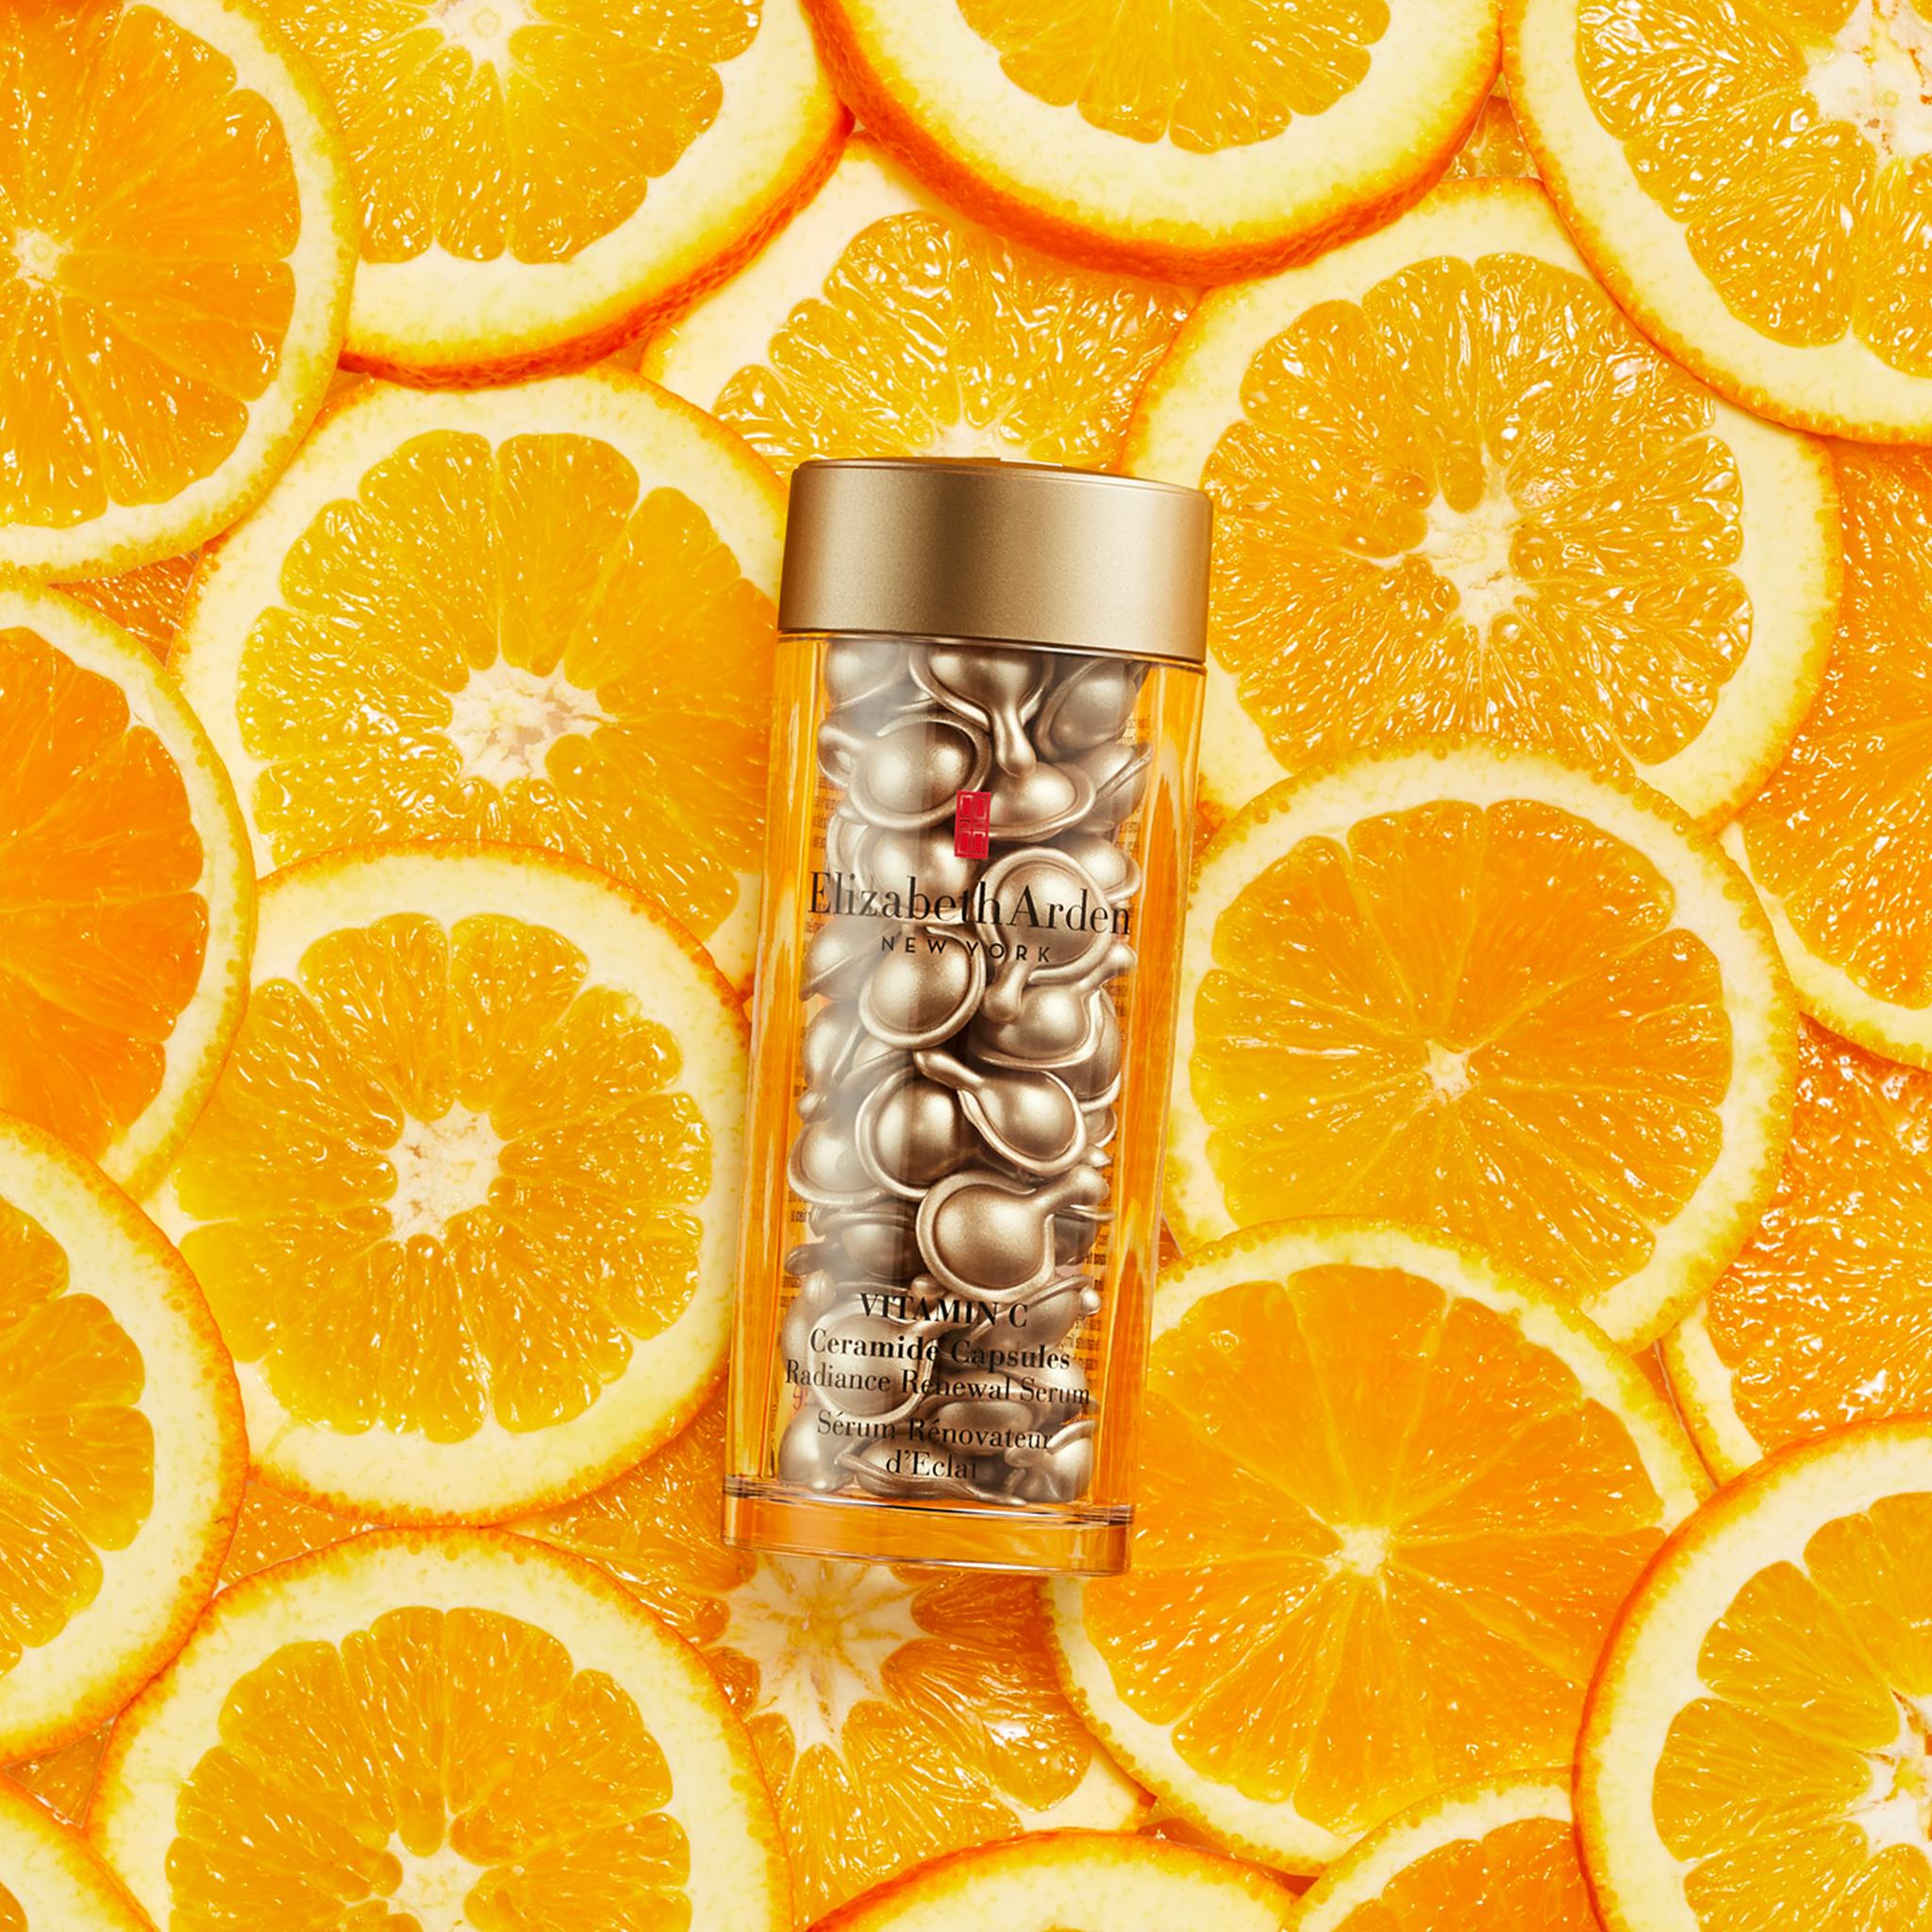 C-Vitamin, ceramidekapsler, julekalender, Elizabeth Arden, klar hudtone, glød